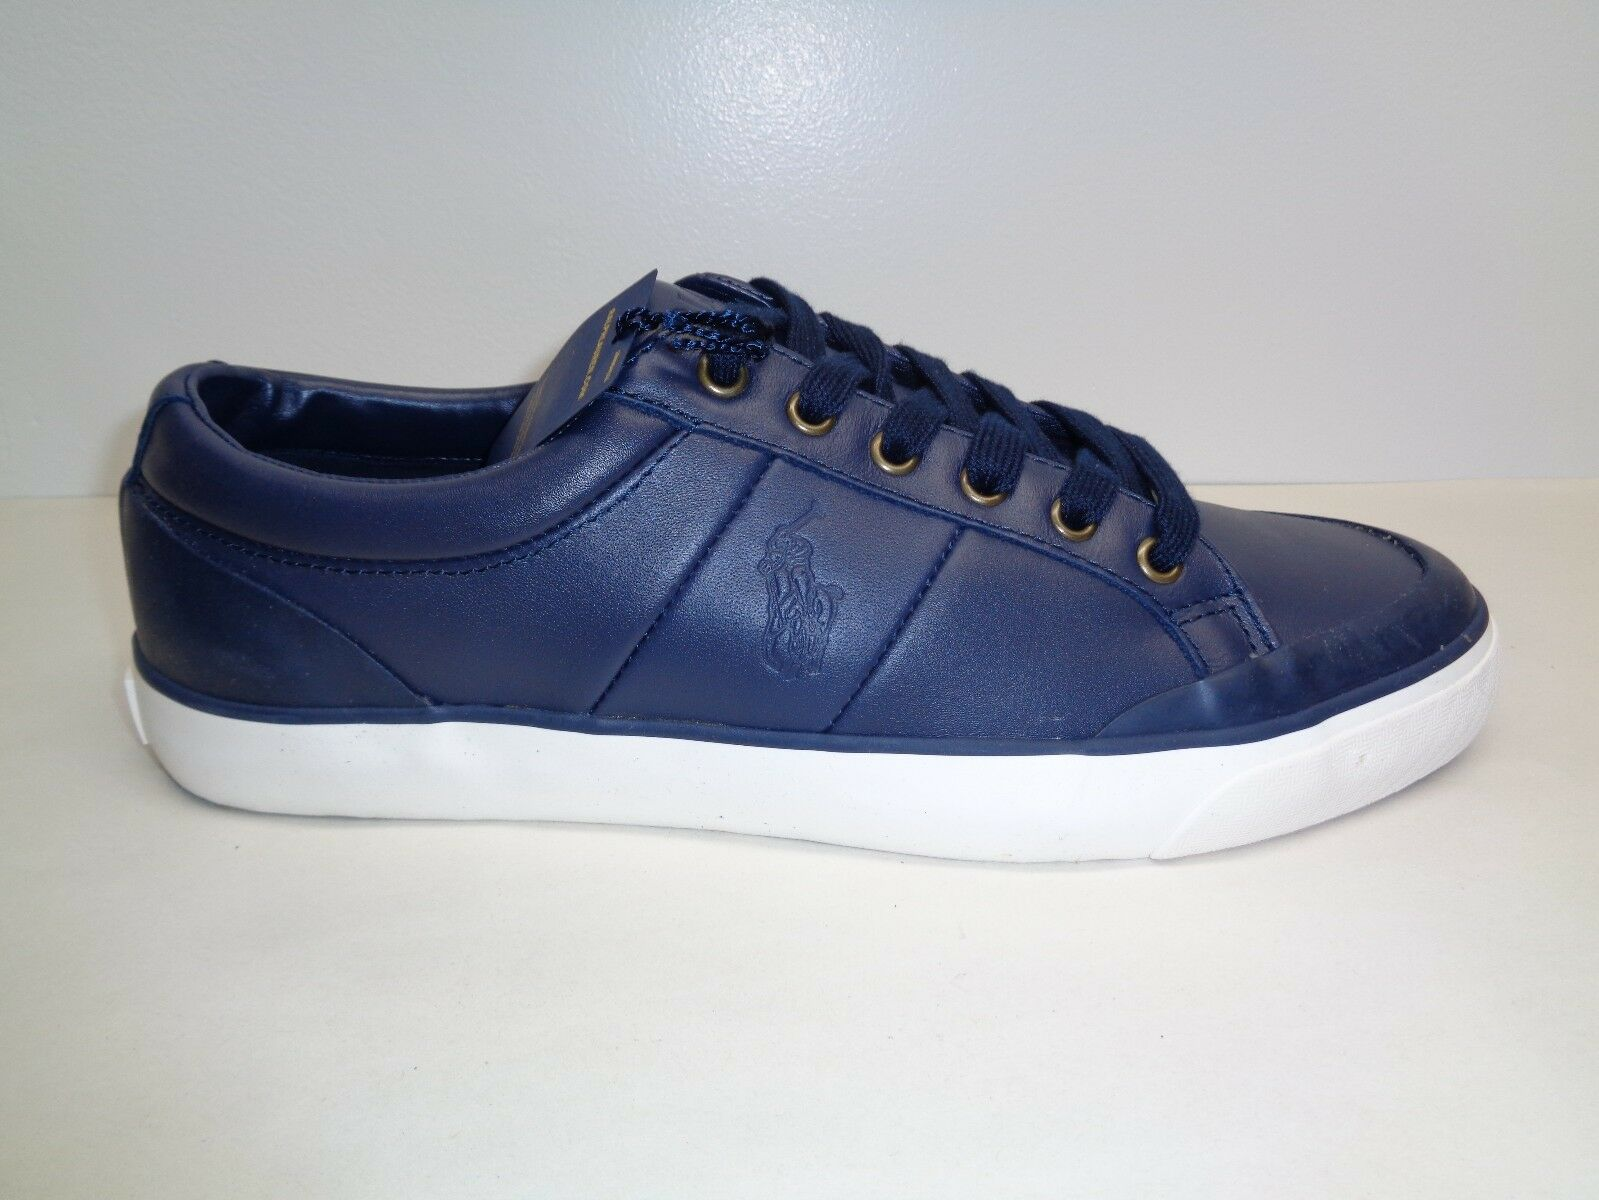 Polo Ralph Lauren Size 8.5 M IAN Navy Leather Fashion Scarpe da Ginnastica New Uomo Shoes